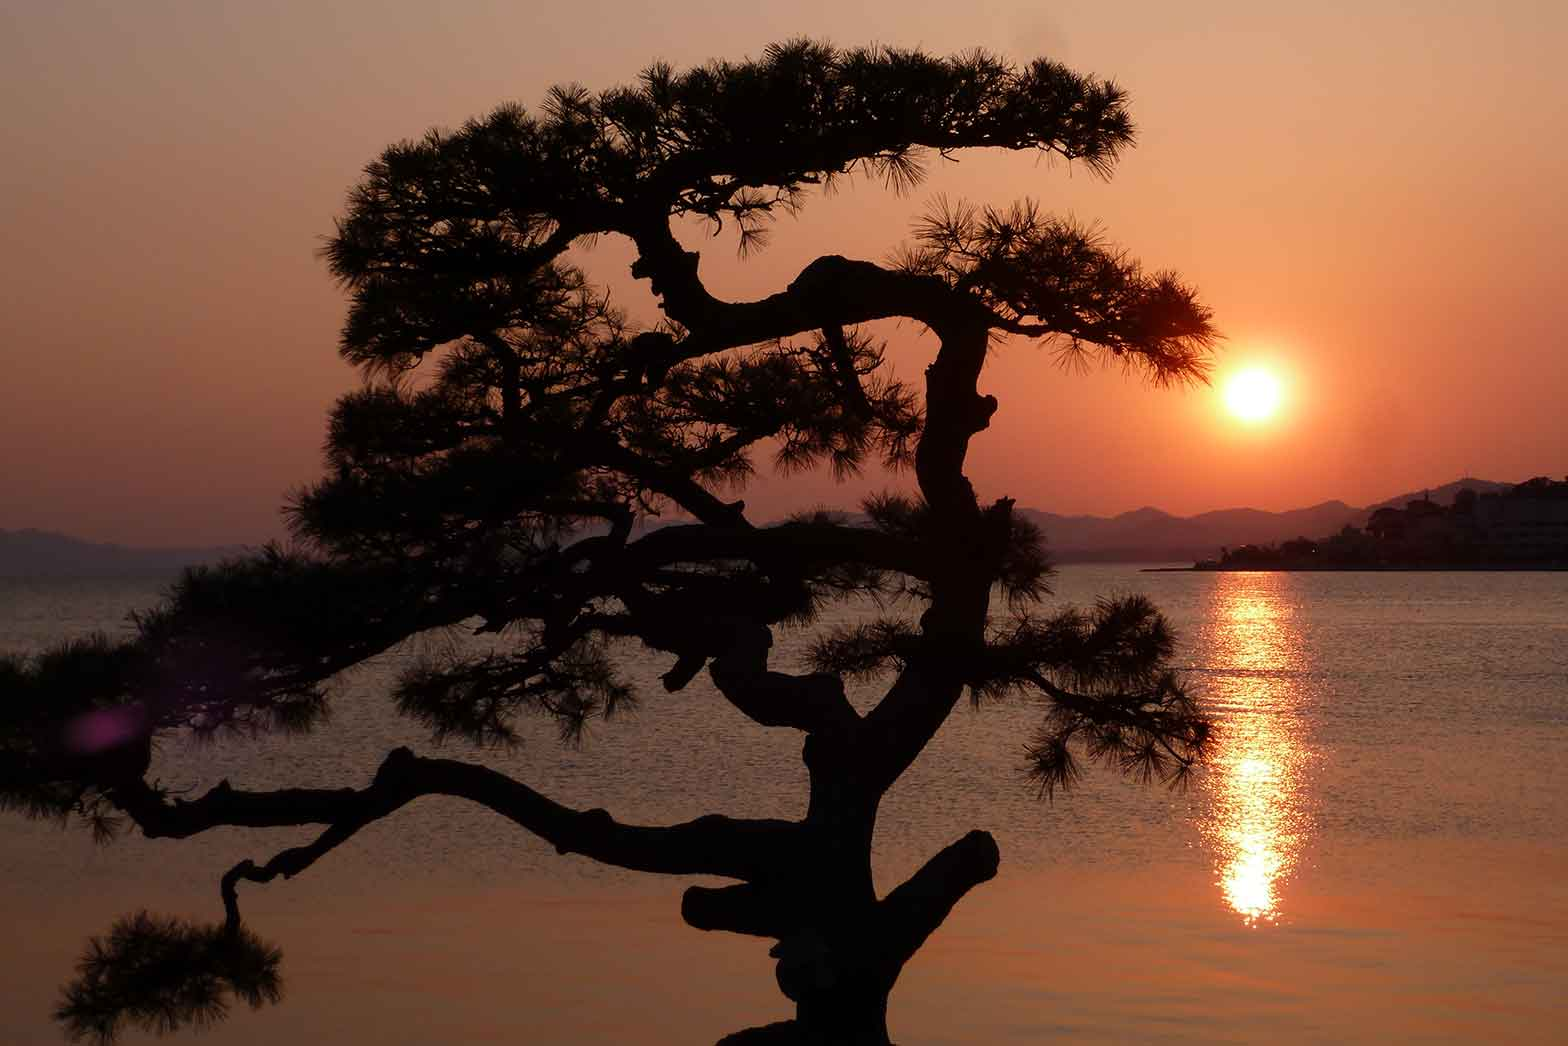 Sunset in Matsue